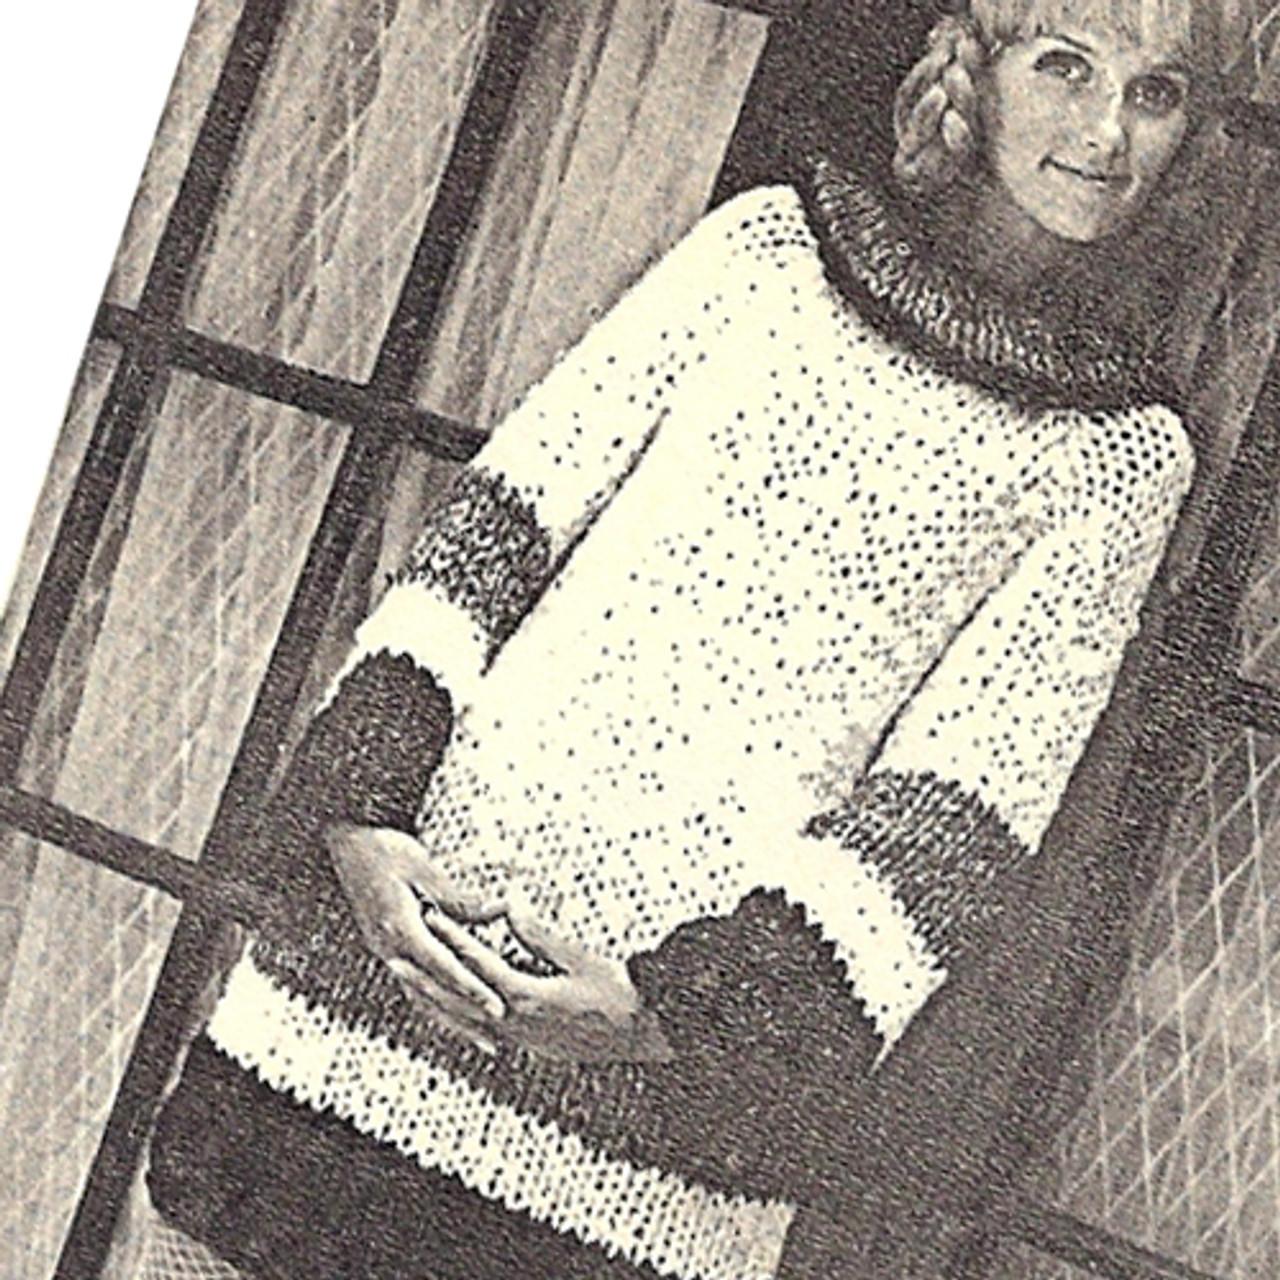 Vintage Knitted Striped Dress, Jumbo Jet Needles